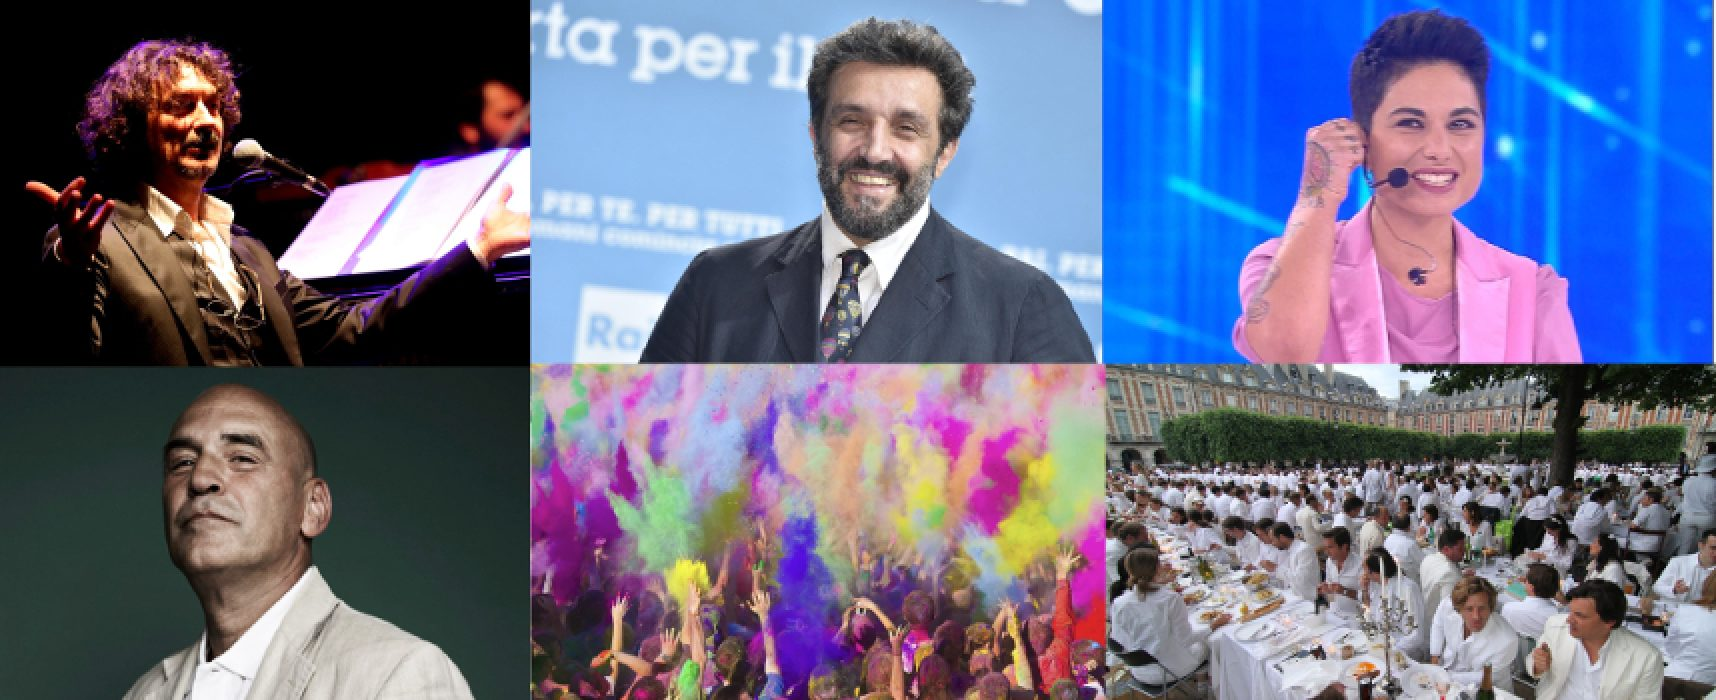 Insinna, Giordana, Cammariere, street food, arti e jazz nell'Estate Biscegliese 2019 / FOTO